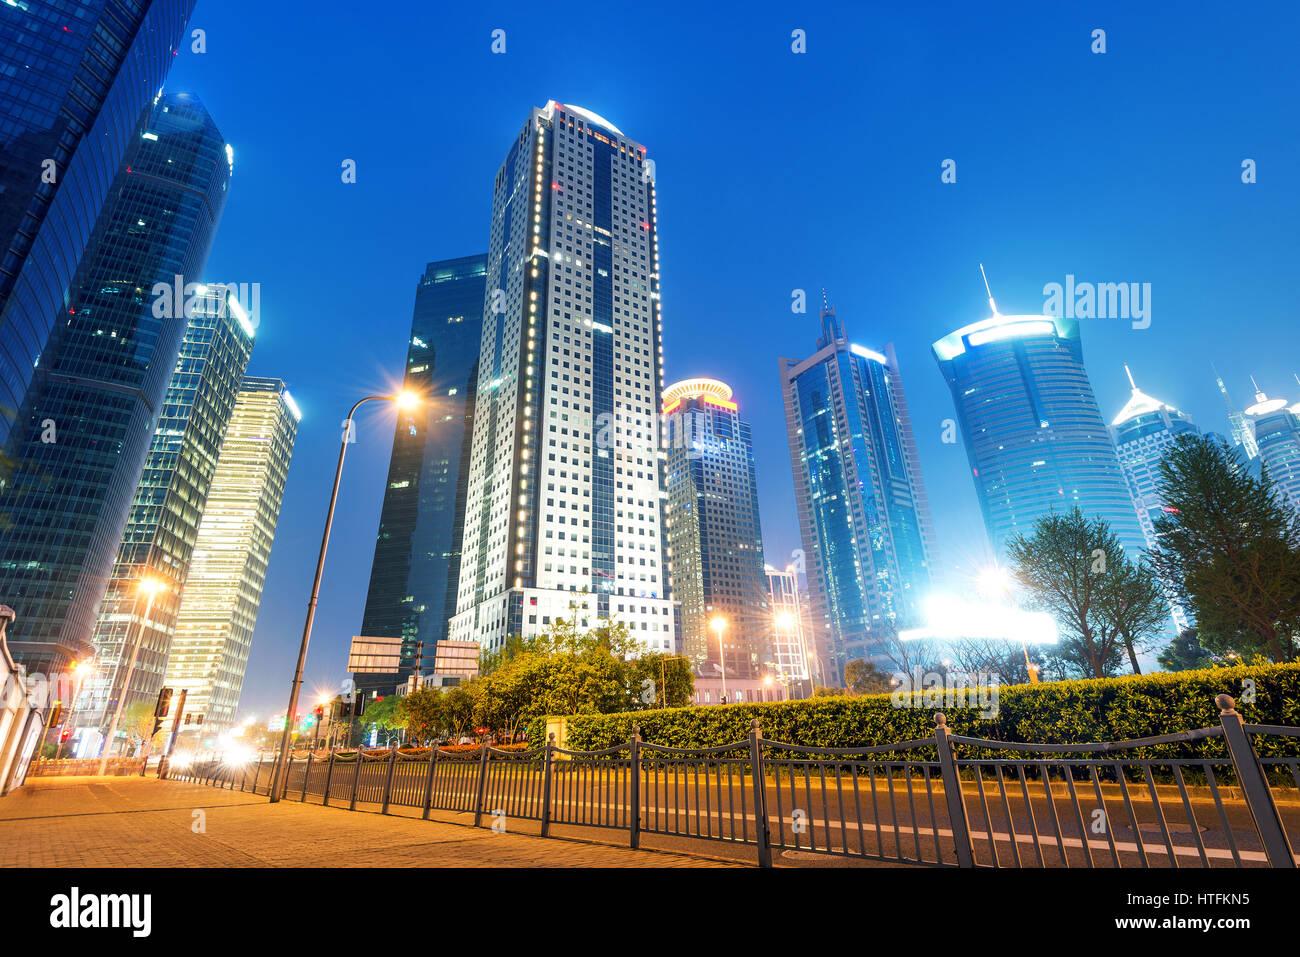 Shanghai Pudong New Area, skyscrapers metropolis, in April 2015. - Stock Image